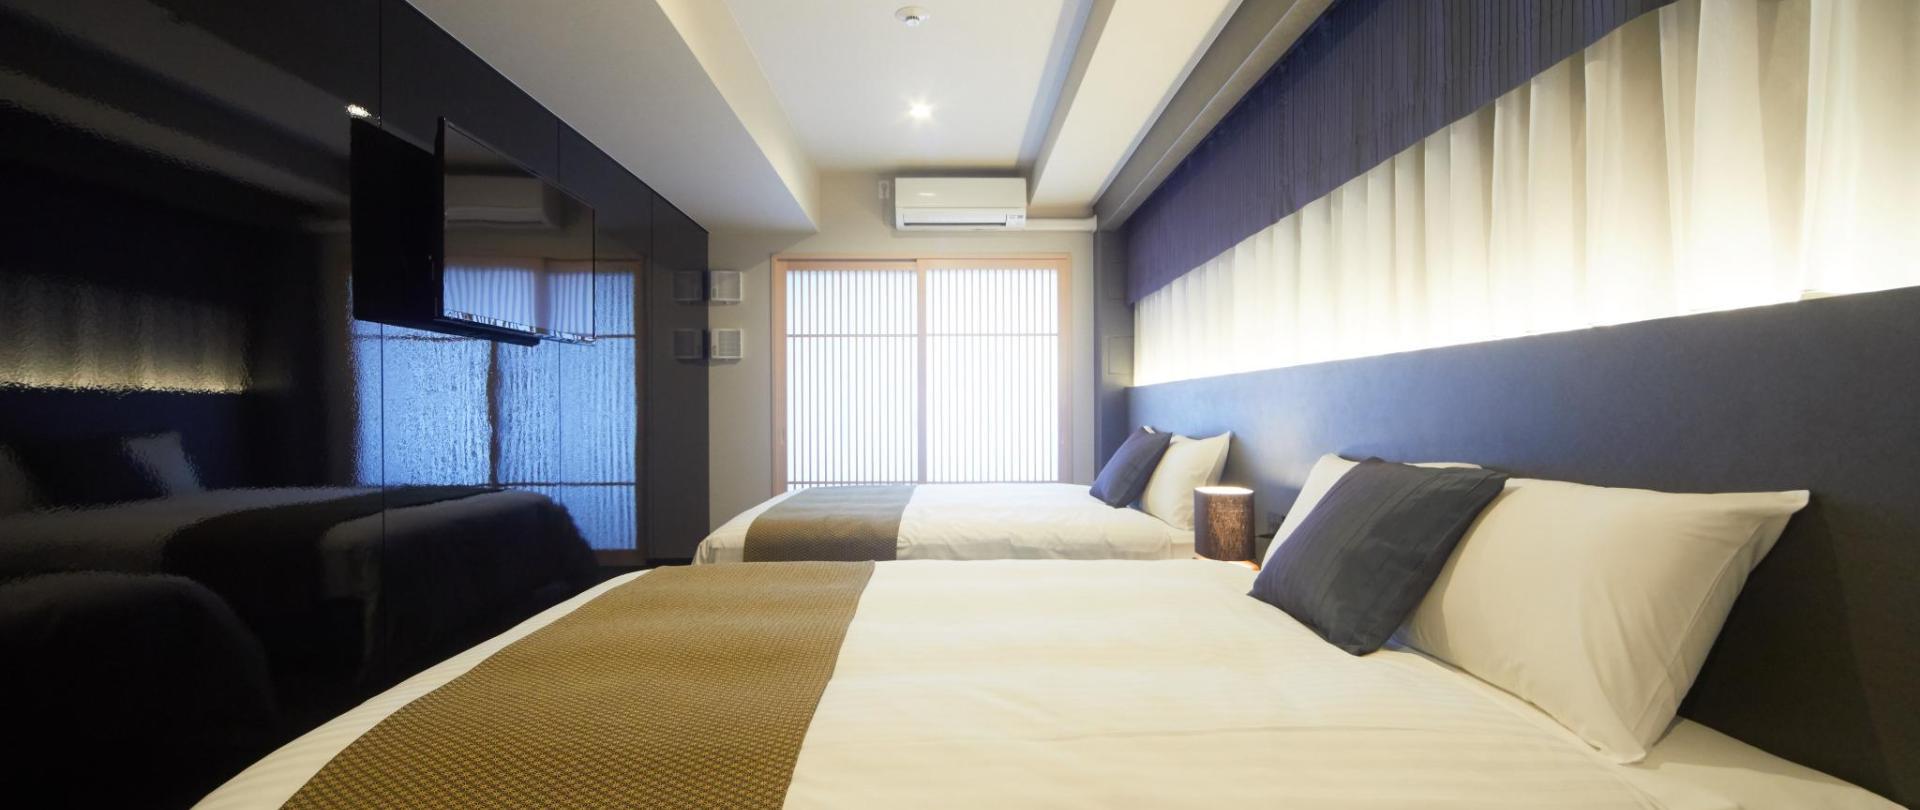 181217_HotelMondonce_141.jpg